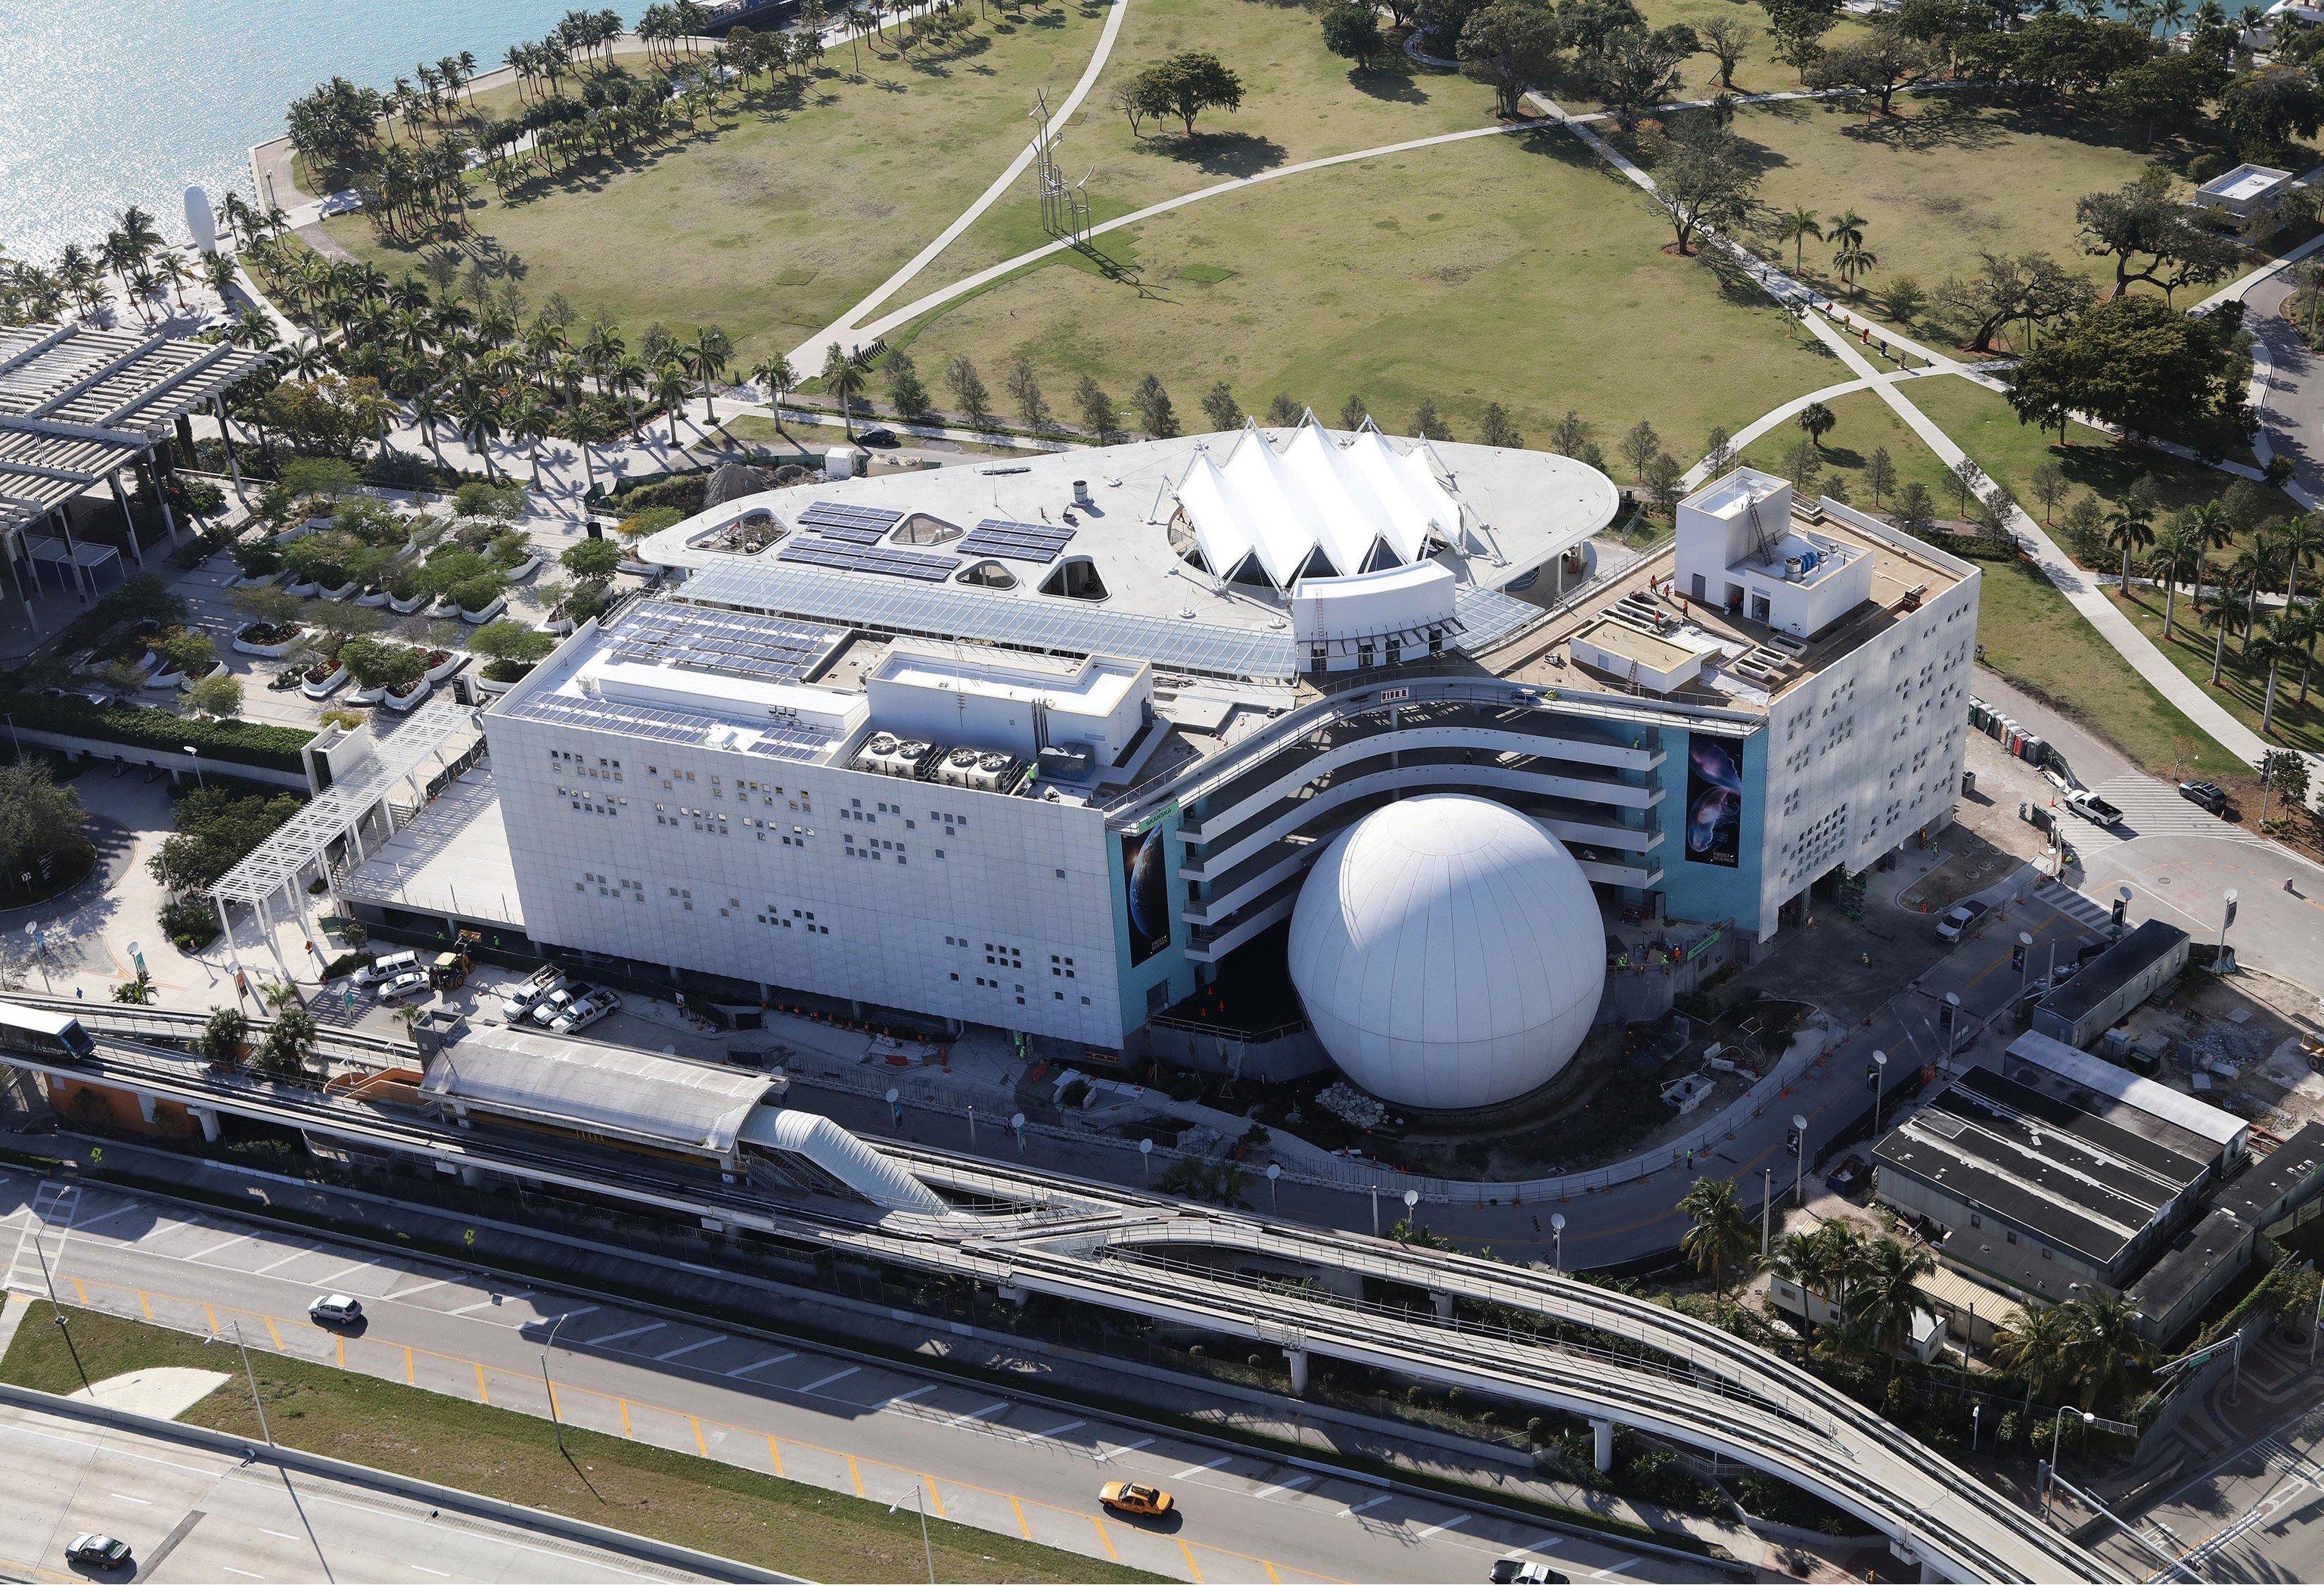 Trip Ideas outdoor transport structure aerial photography sport venue bird's eye view stadium vehicle arena